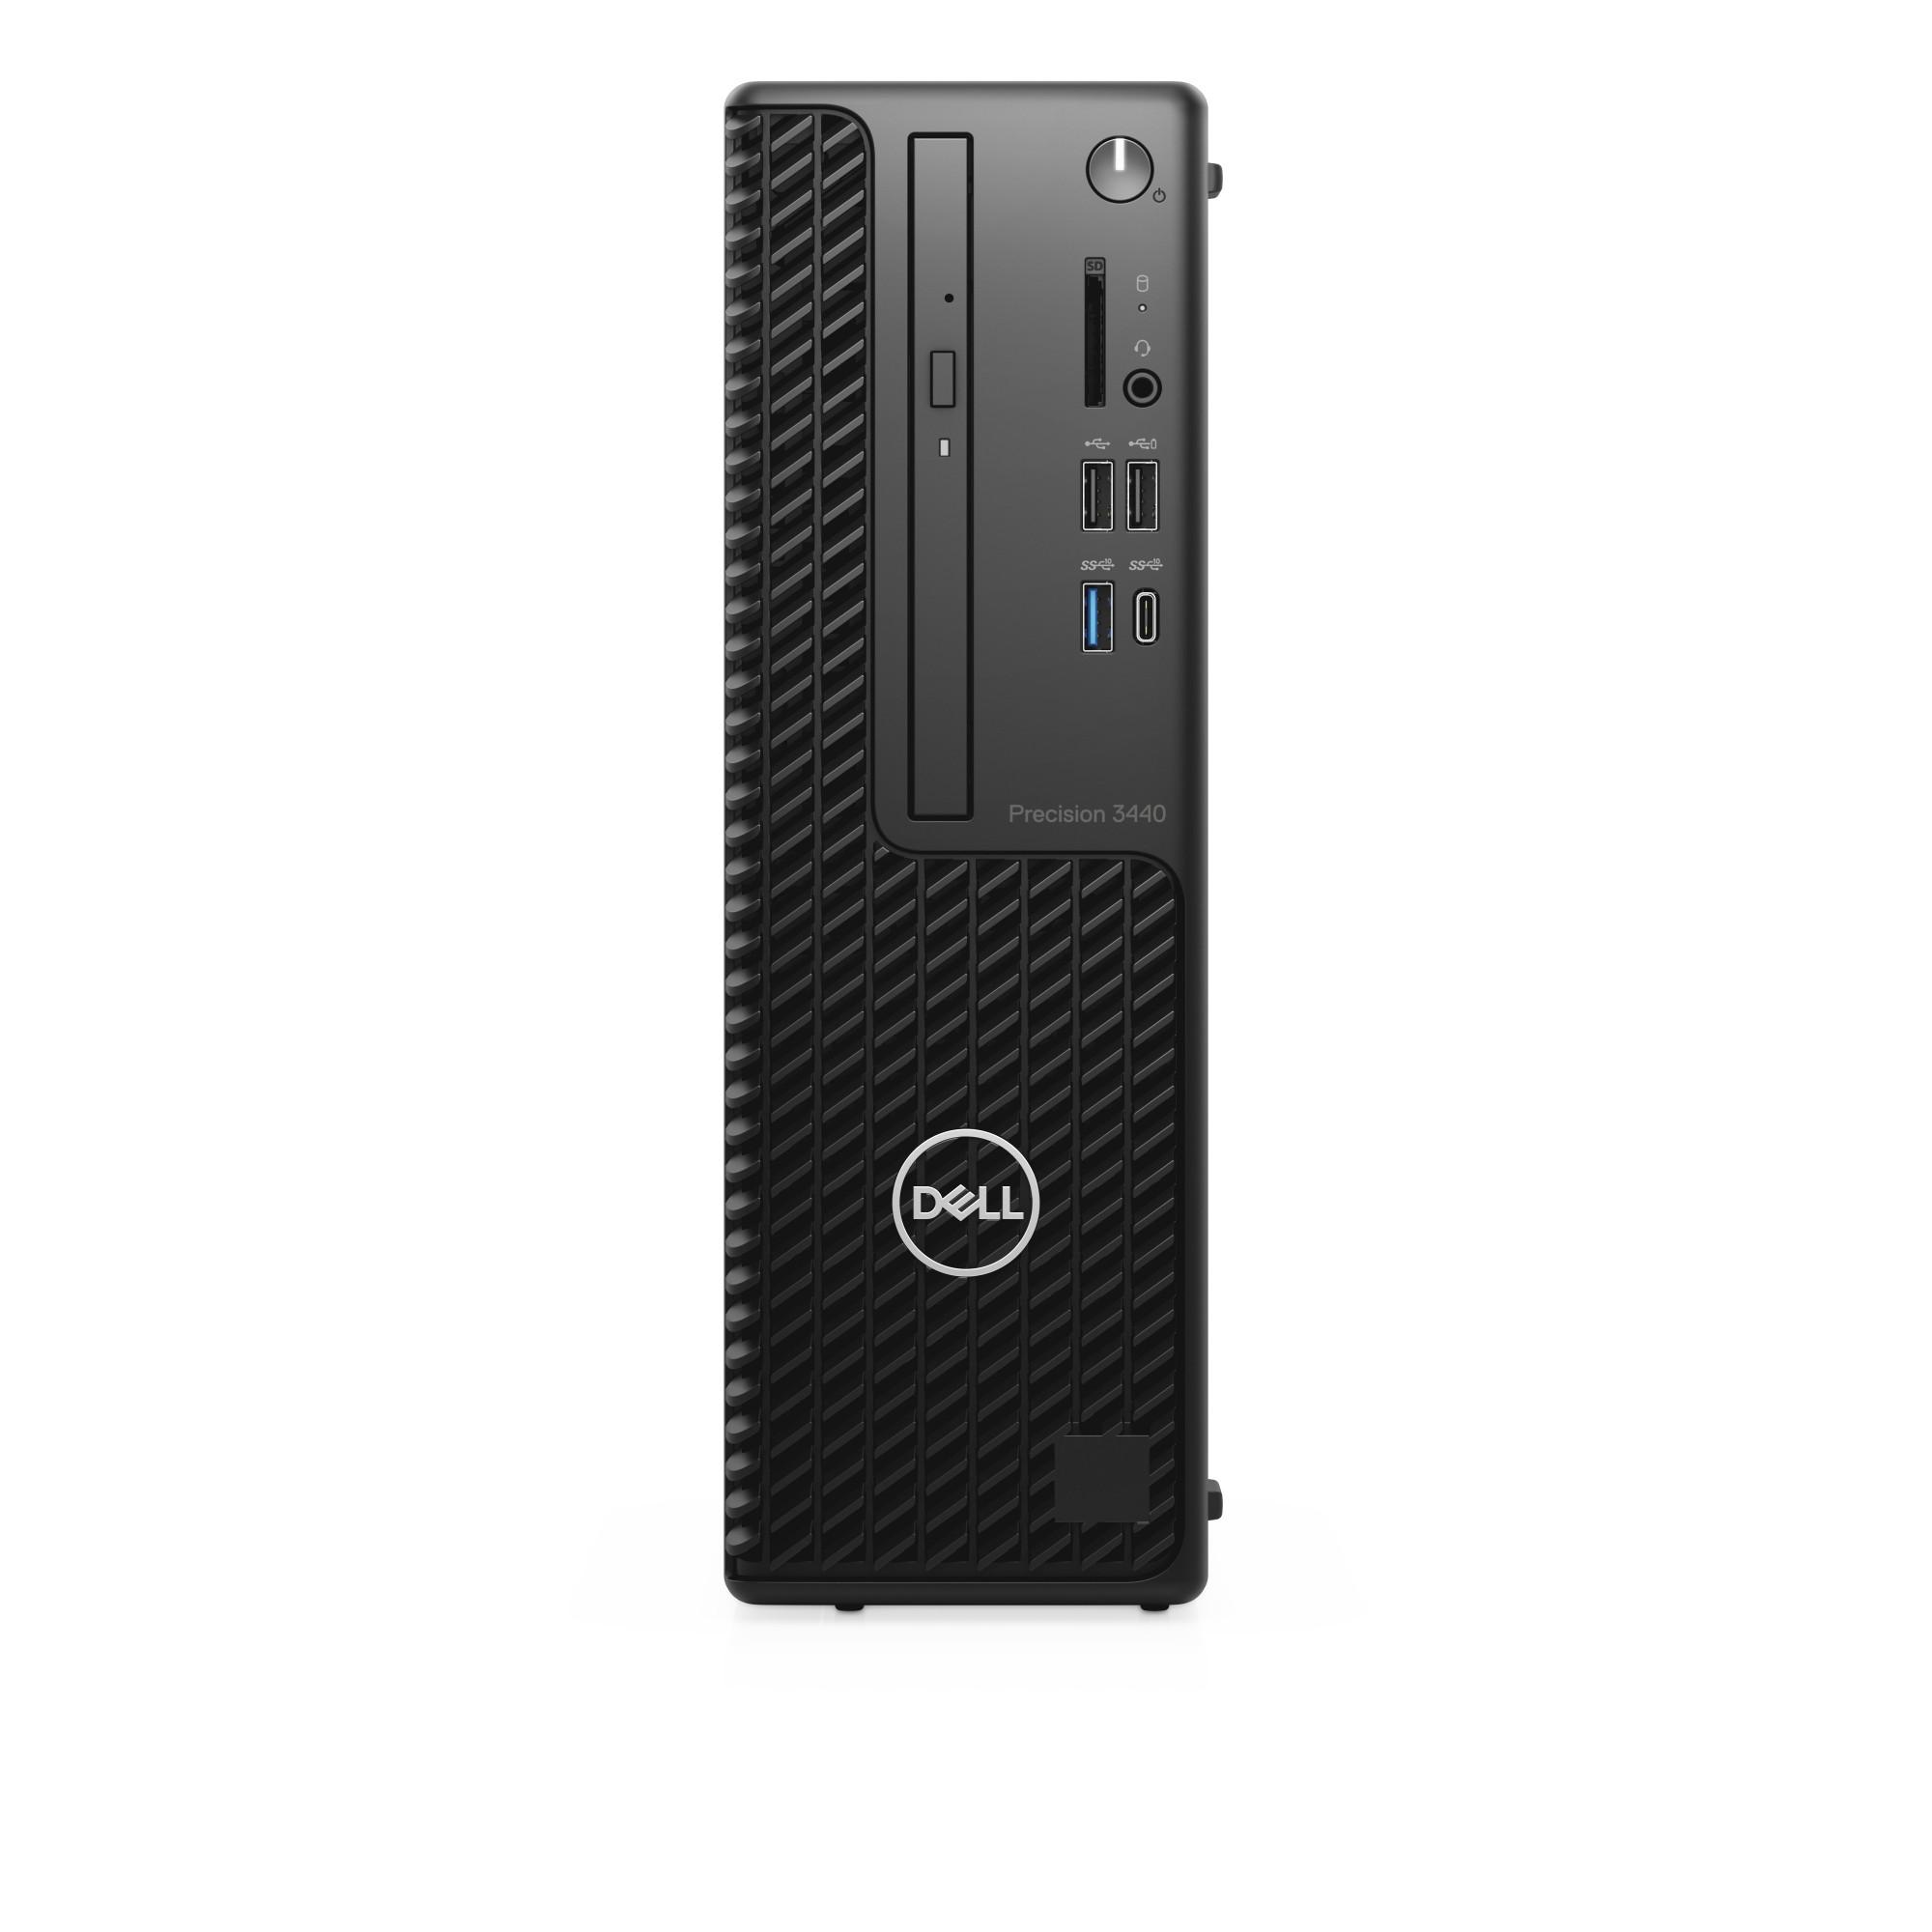 DELL Precision 3440 10th gen Intel® Core™ i7 i7-10700 16 GB DDR4-SDRAM 512 GB SSD SFF Black Workstation Windows 10 Pro